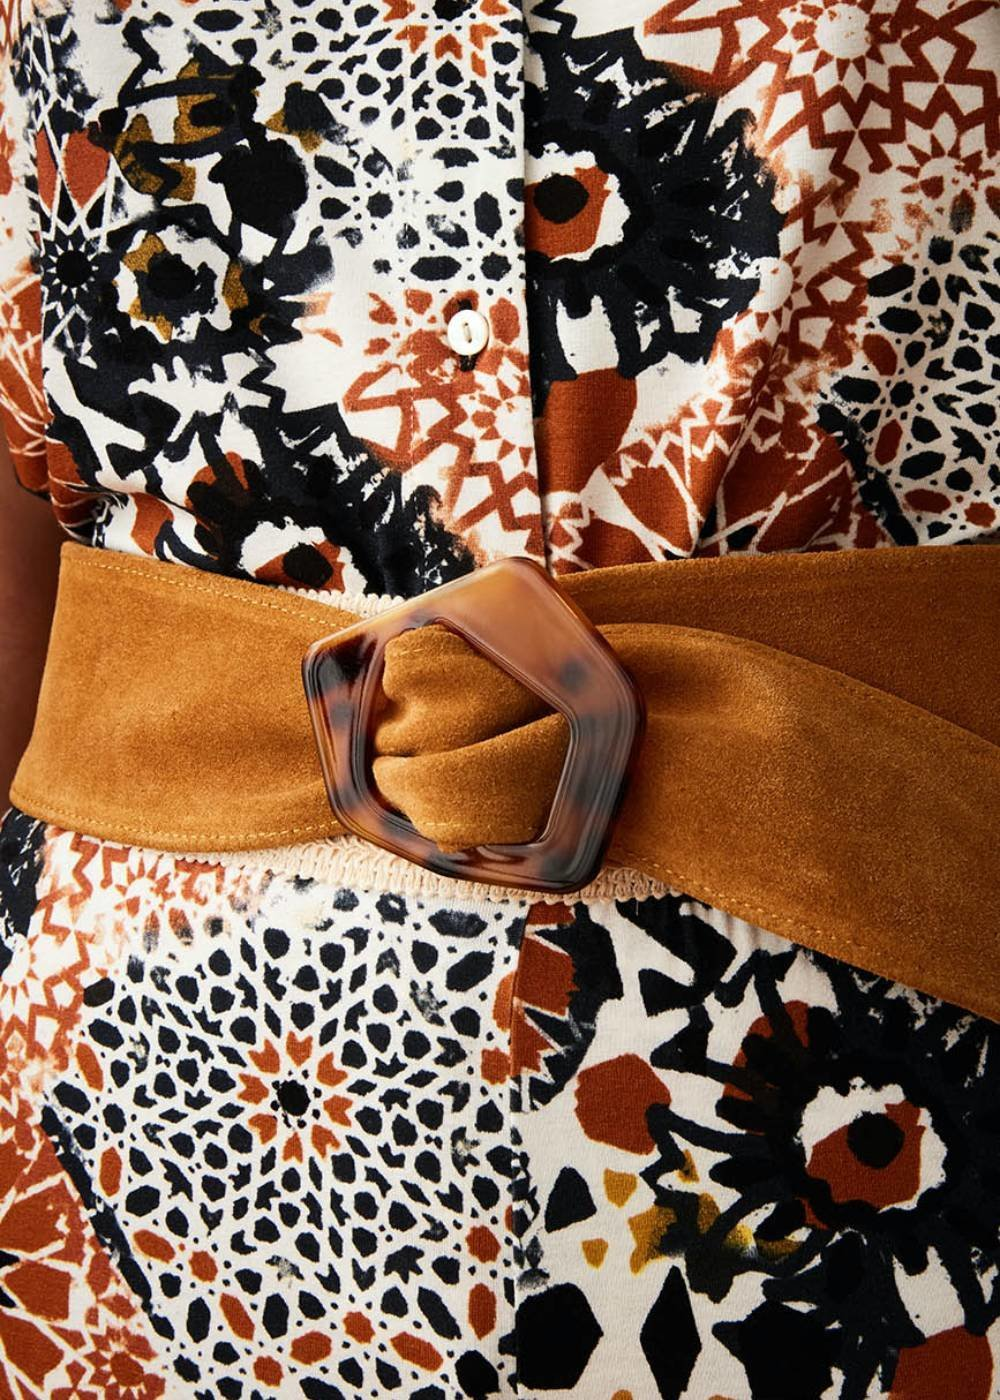 Corinn genuine leather belt with animal print buckle - Curcuma - Woman